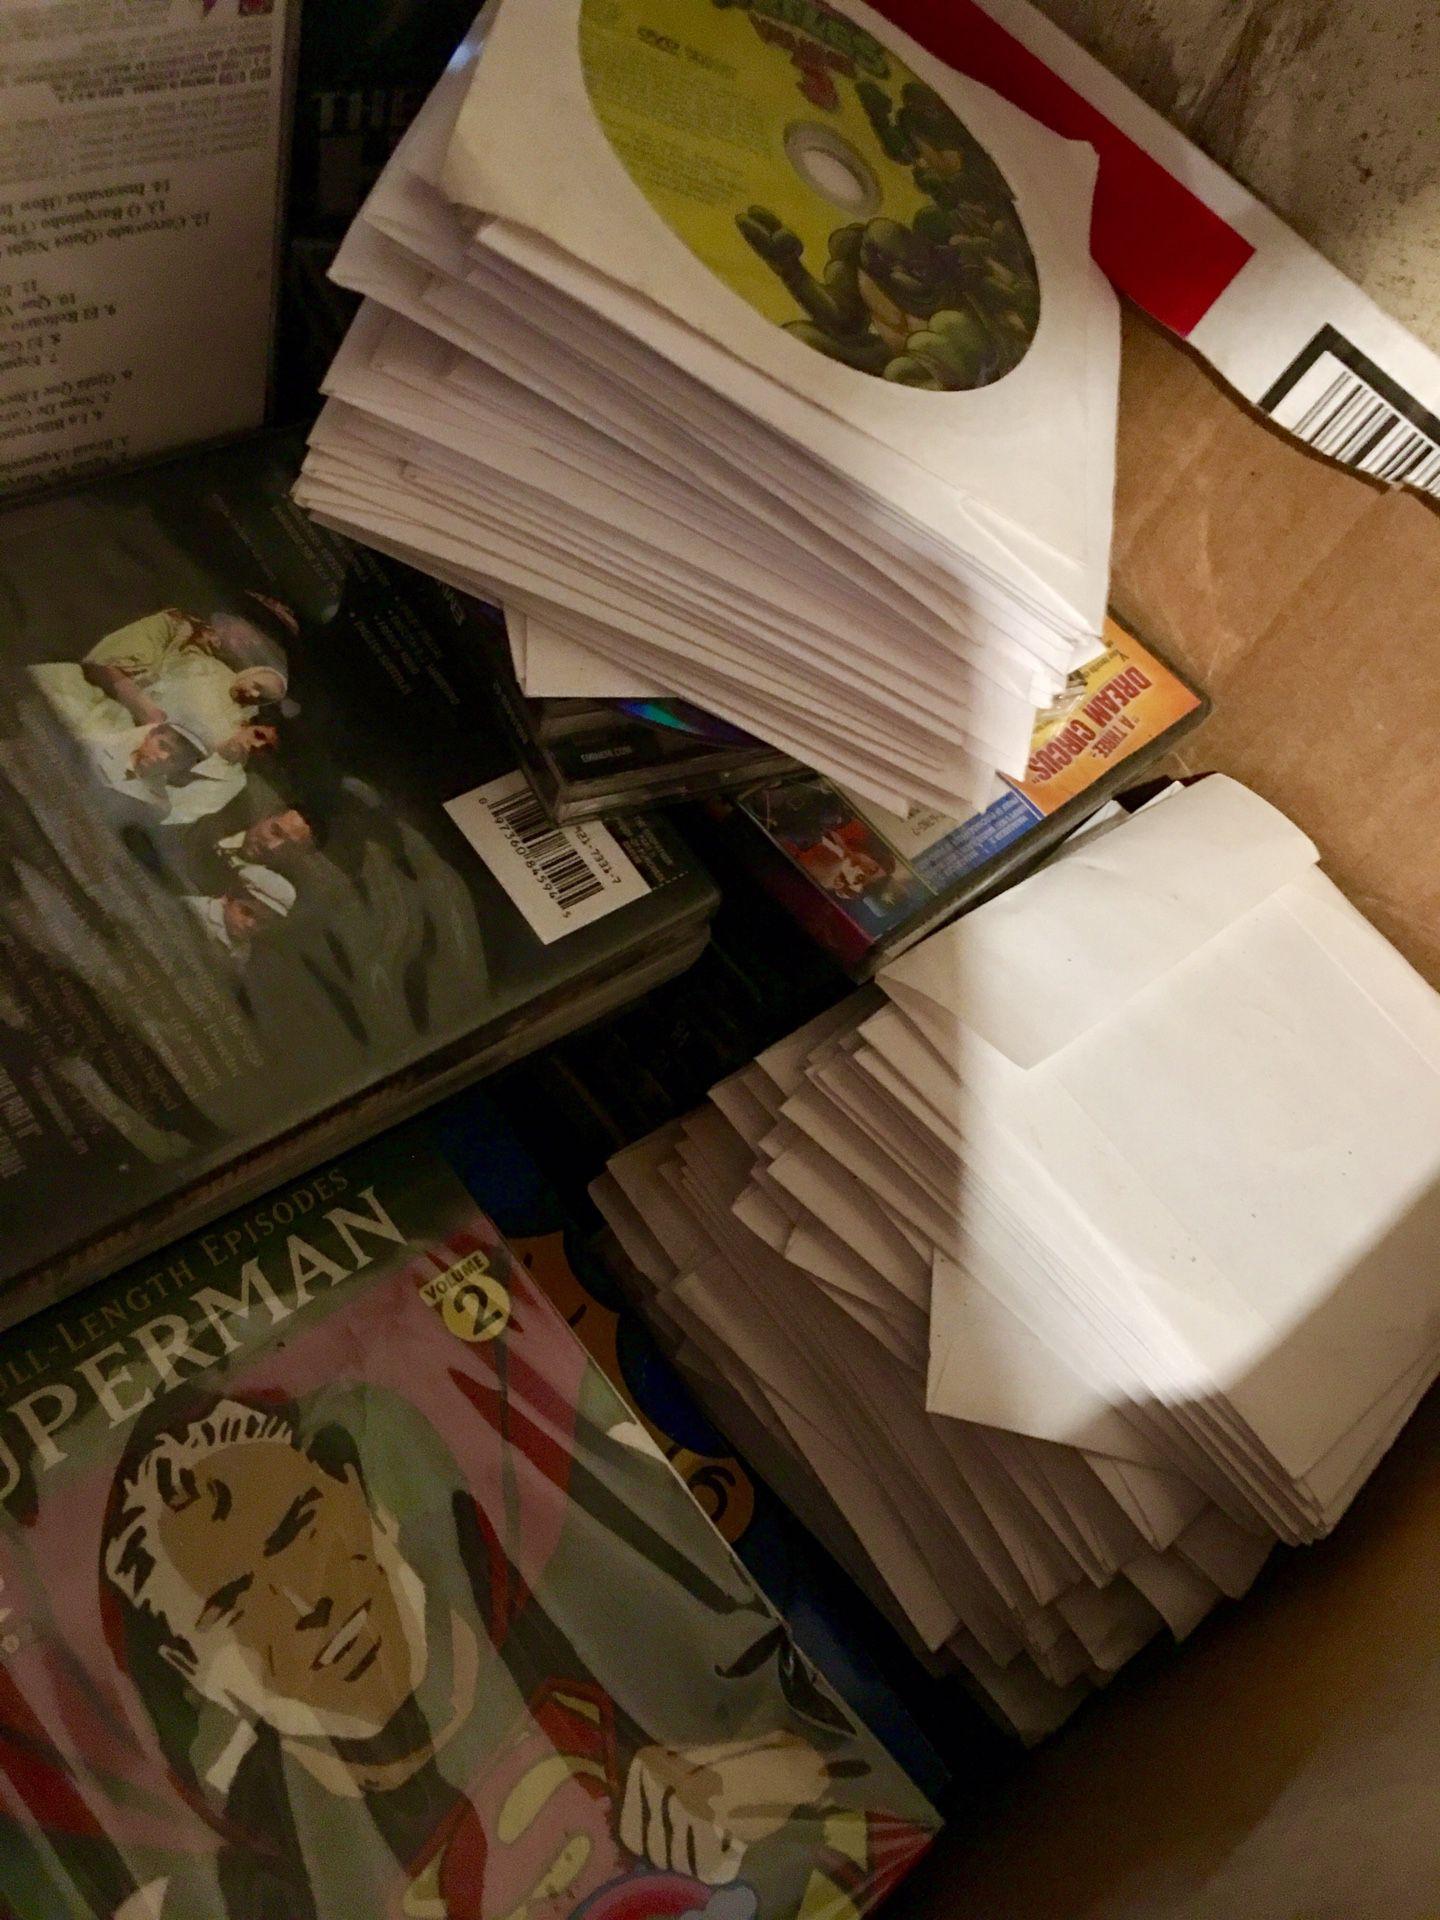 Big box of dvds